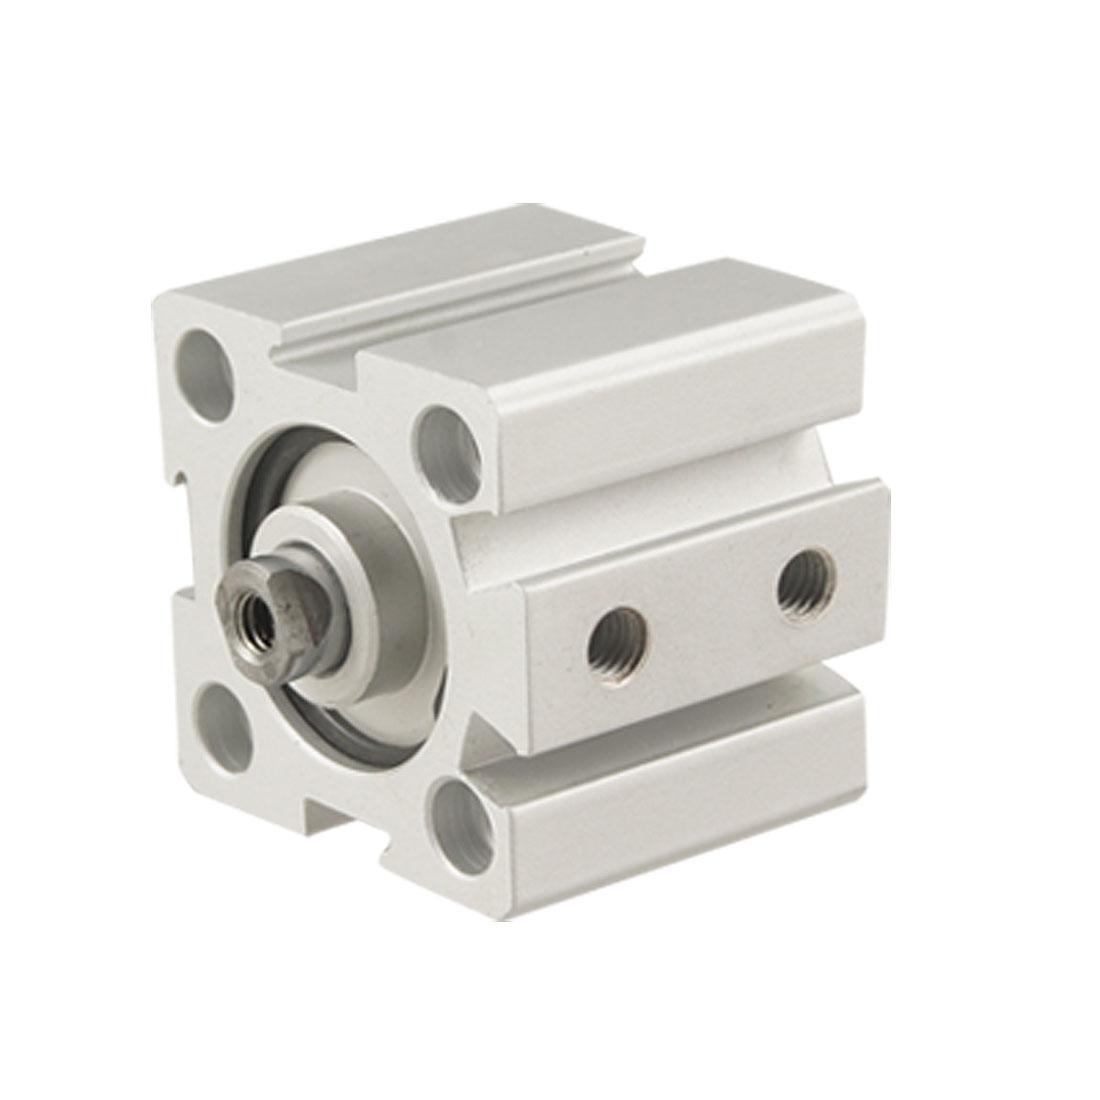 Single Rod SDA 20 x 10 Double Action Mini Pneumatic Cylinder